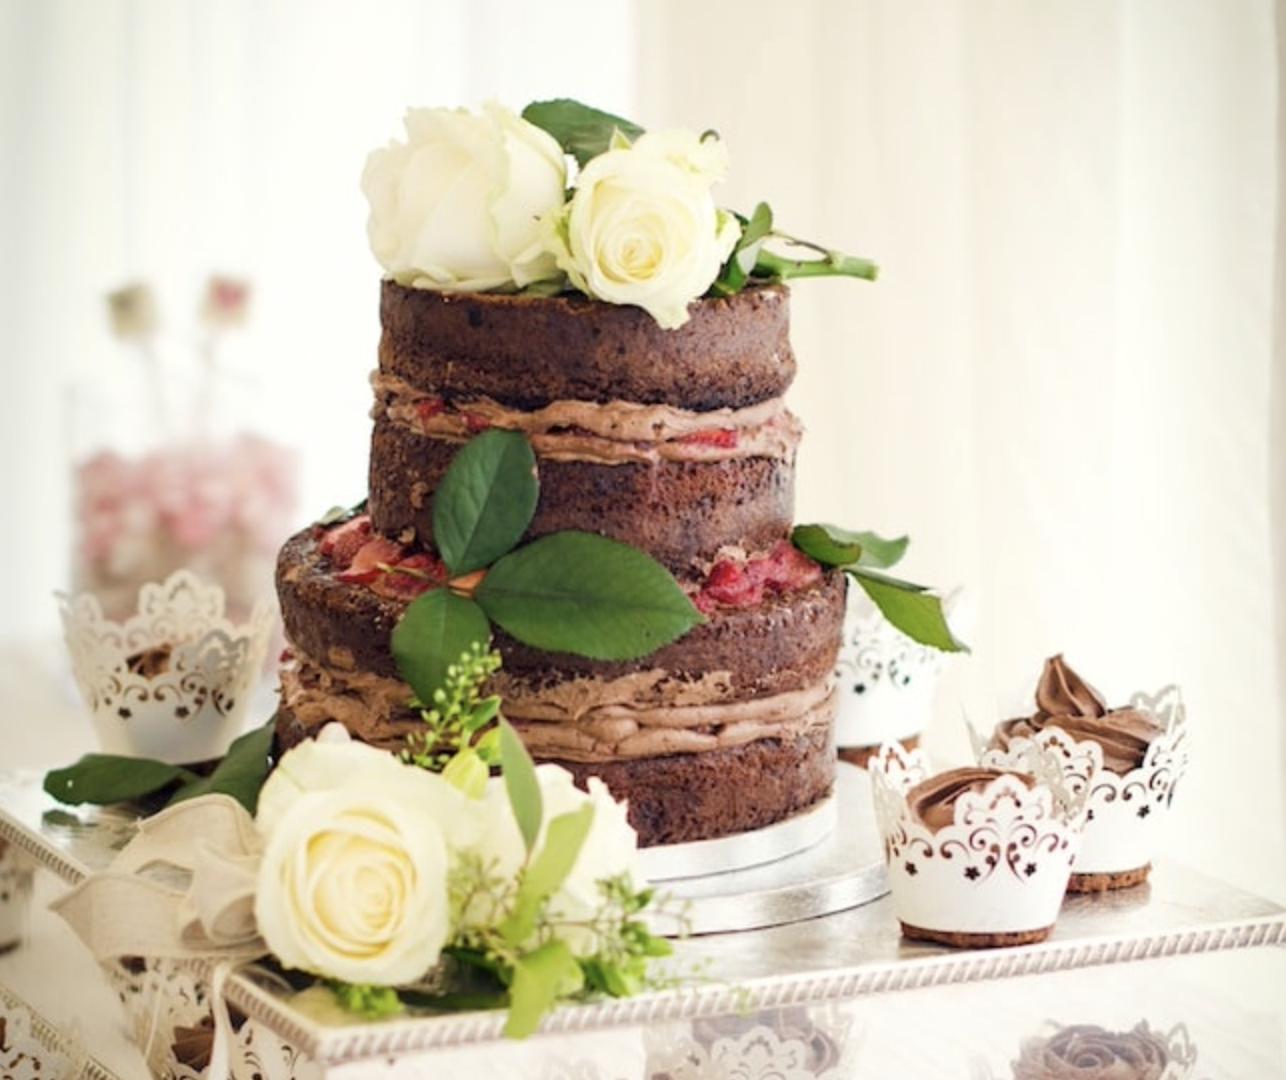 gluten-free DIY wedding cake